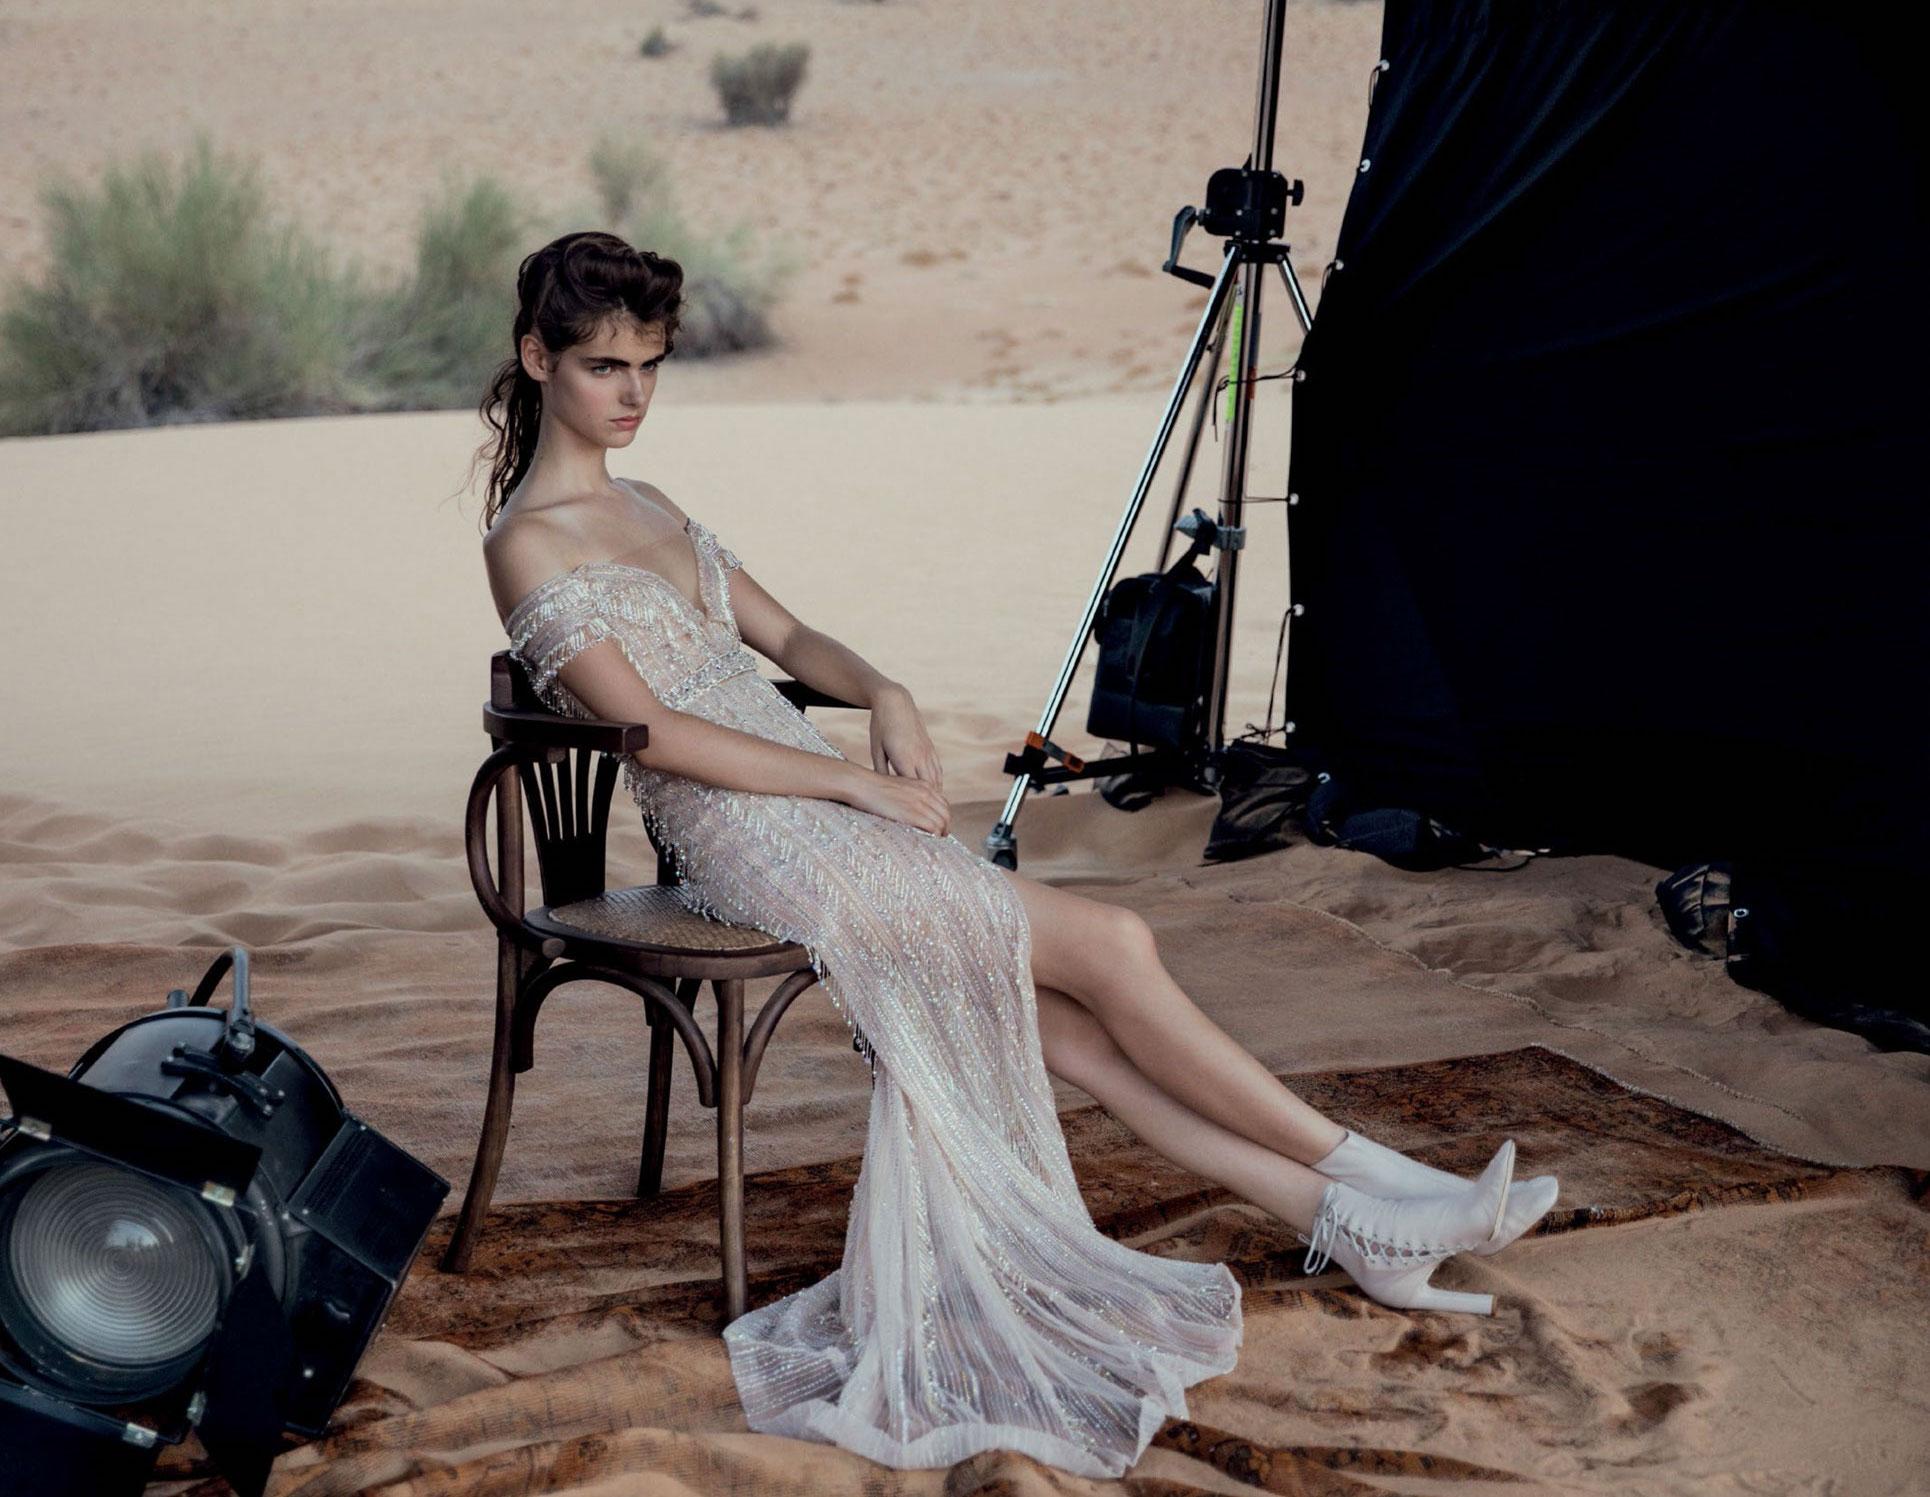 Vogue-Arabia-Sept_17-DPS 2.jpg